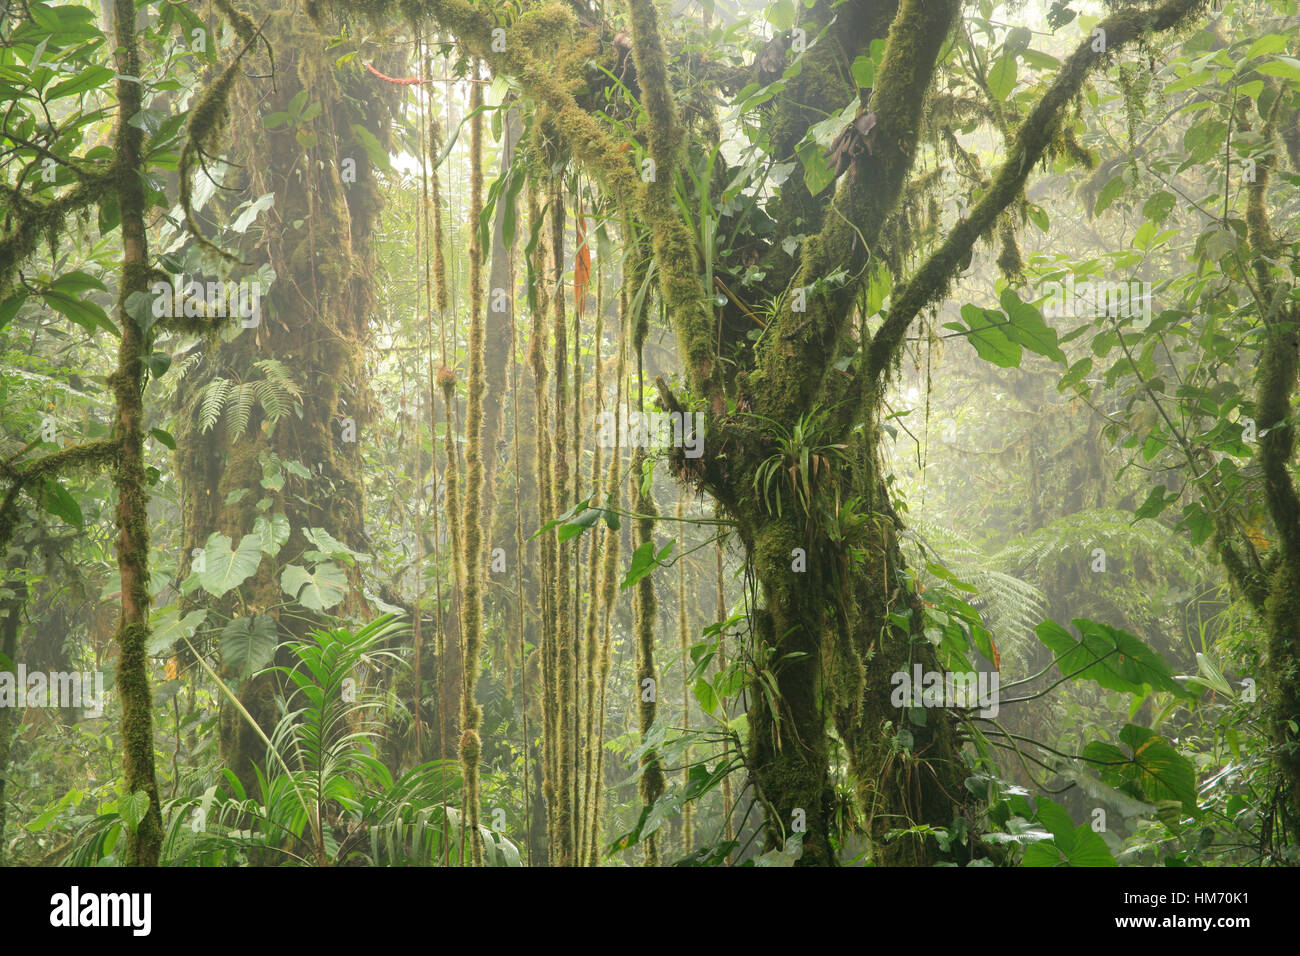 Monteverde Cloud Forest Preserve, Costa Rica - Stock Image